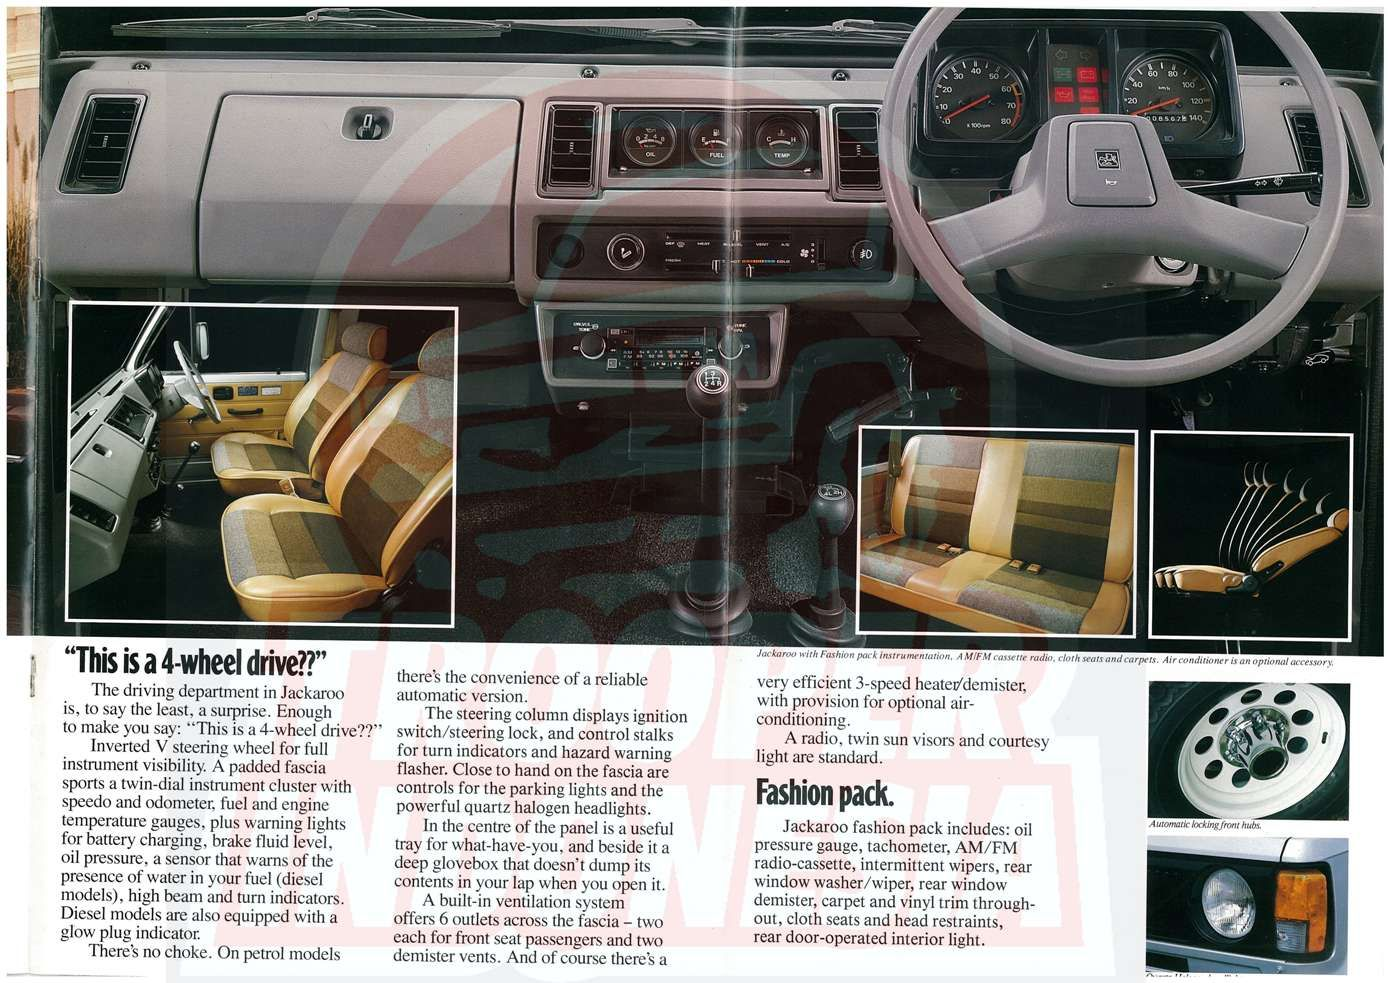 Holden_Jackaroo_1982_p4.jpg